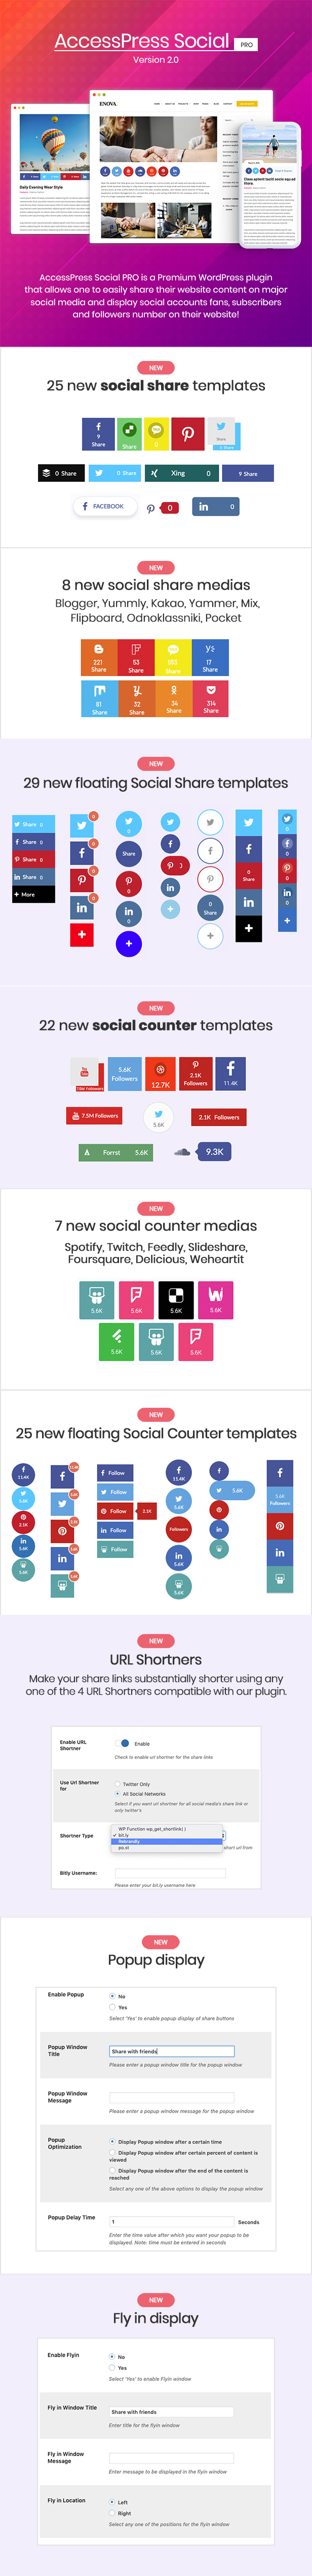 AccessPress Social Pro - 2